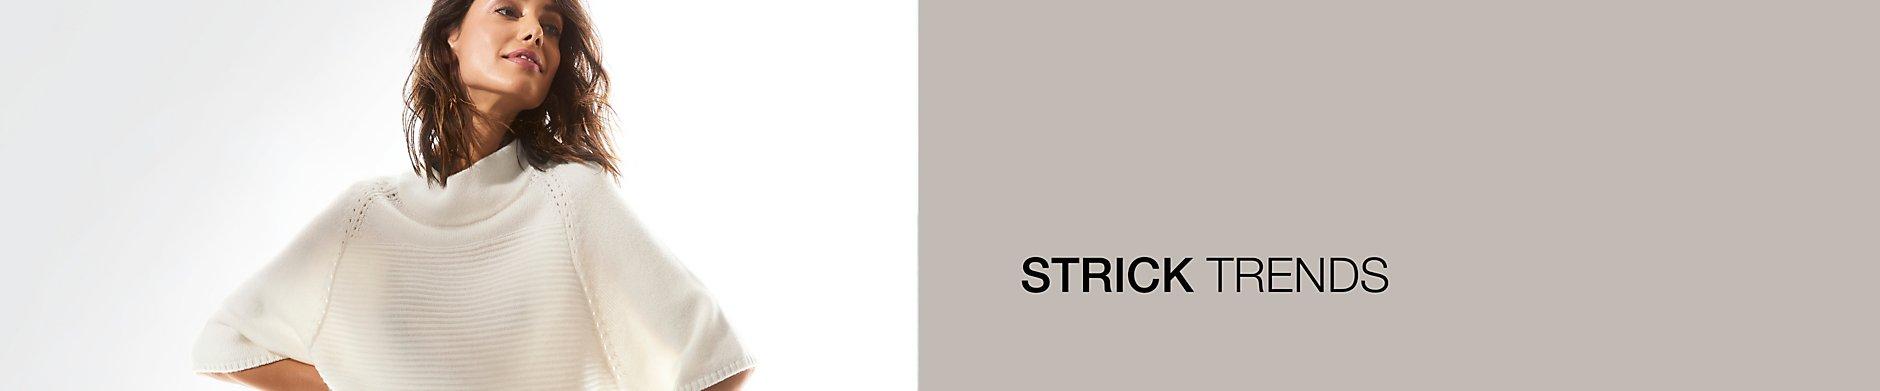 STRICK TRENDS